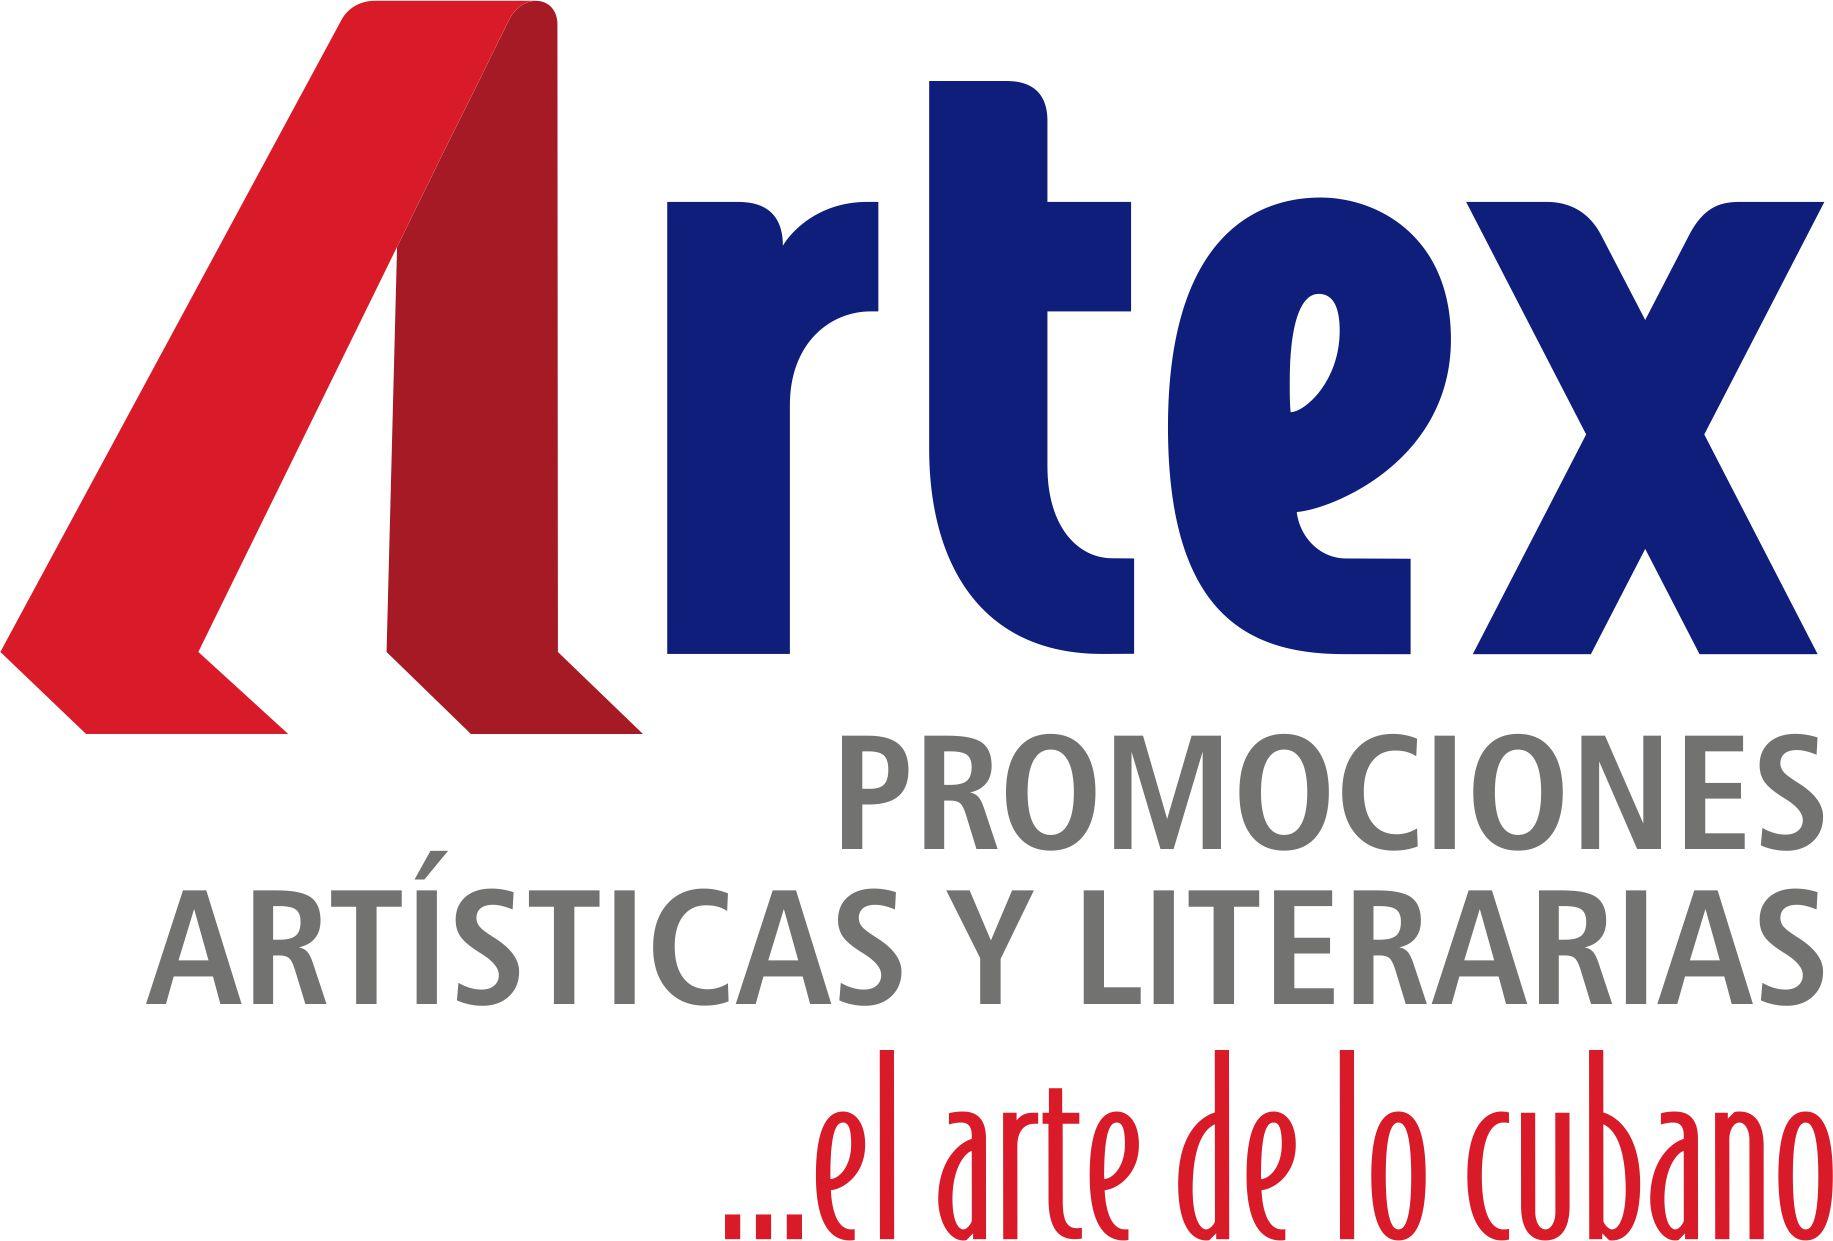 Decana en Cuba de las empresas culturales comercializadoras. Foto: Ministerio de Cultura